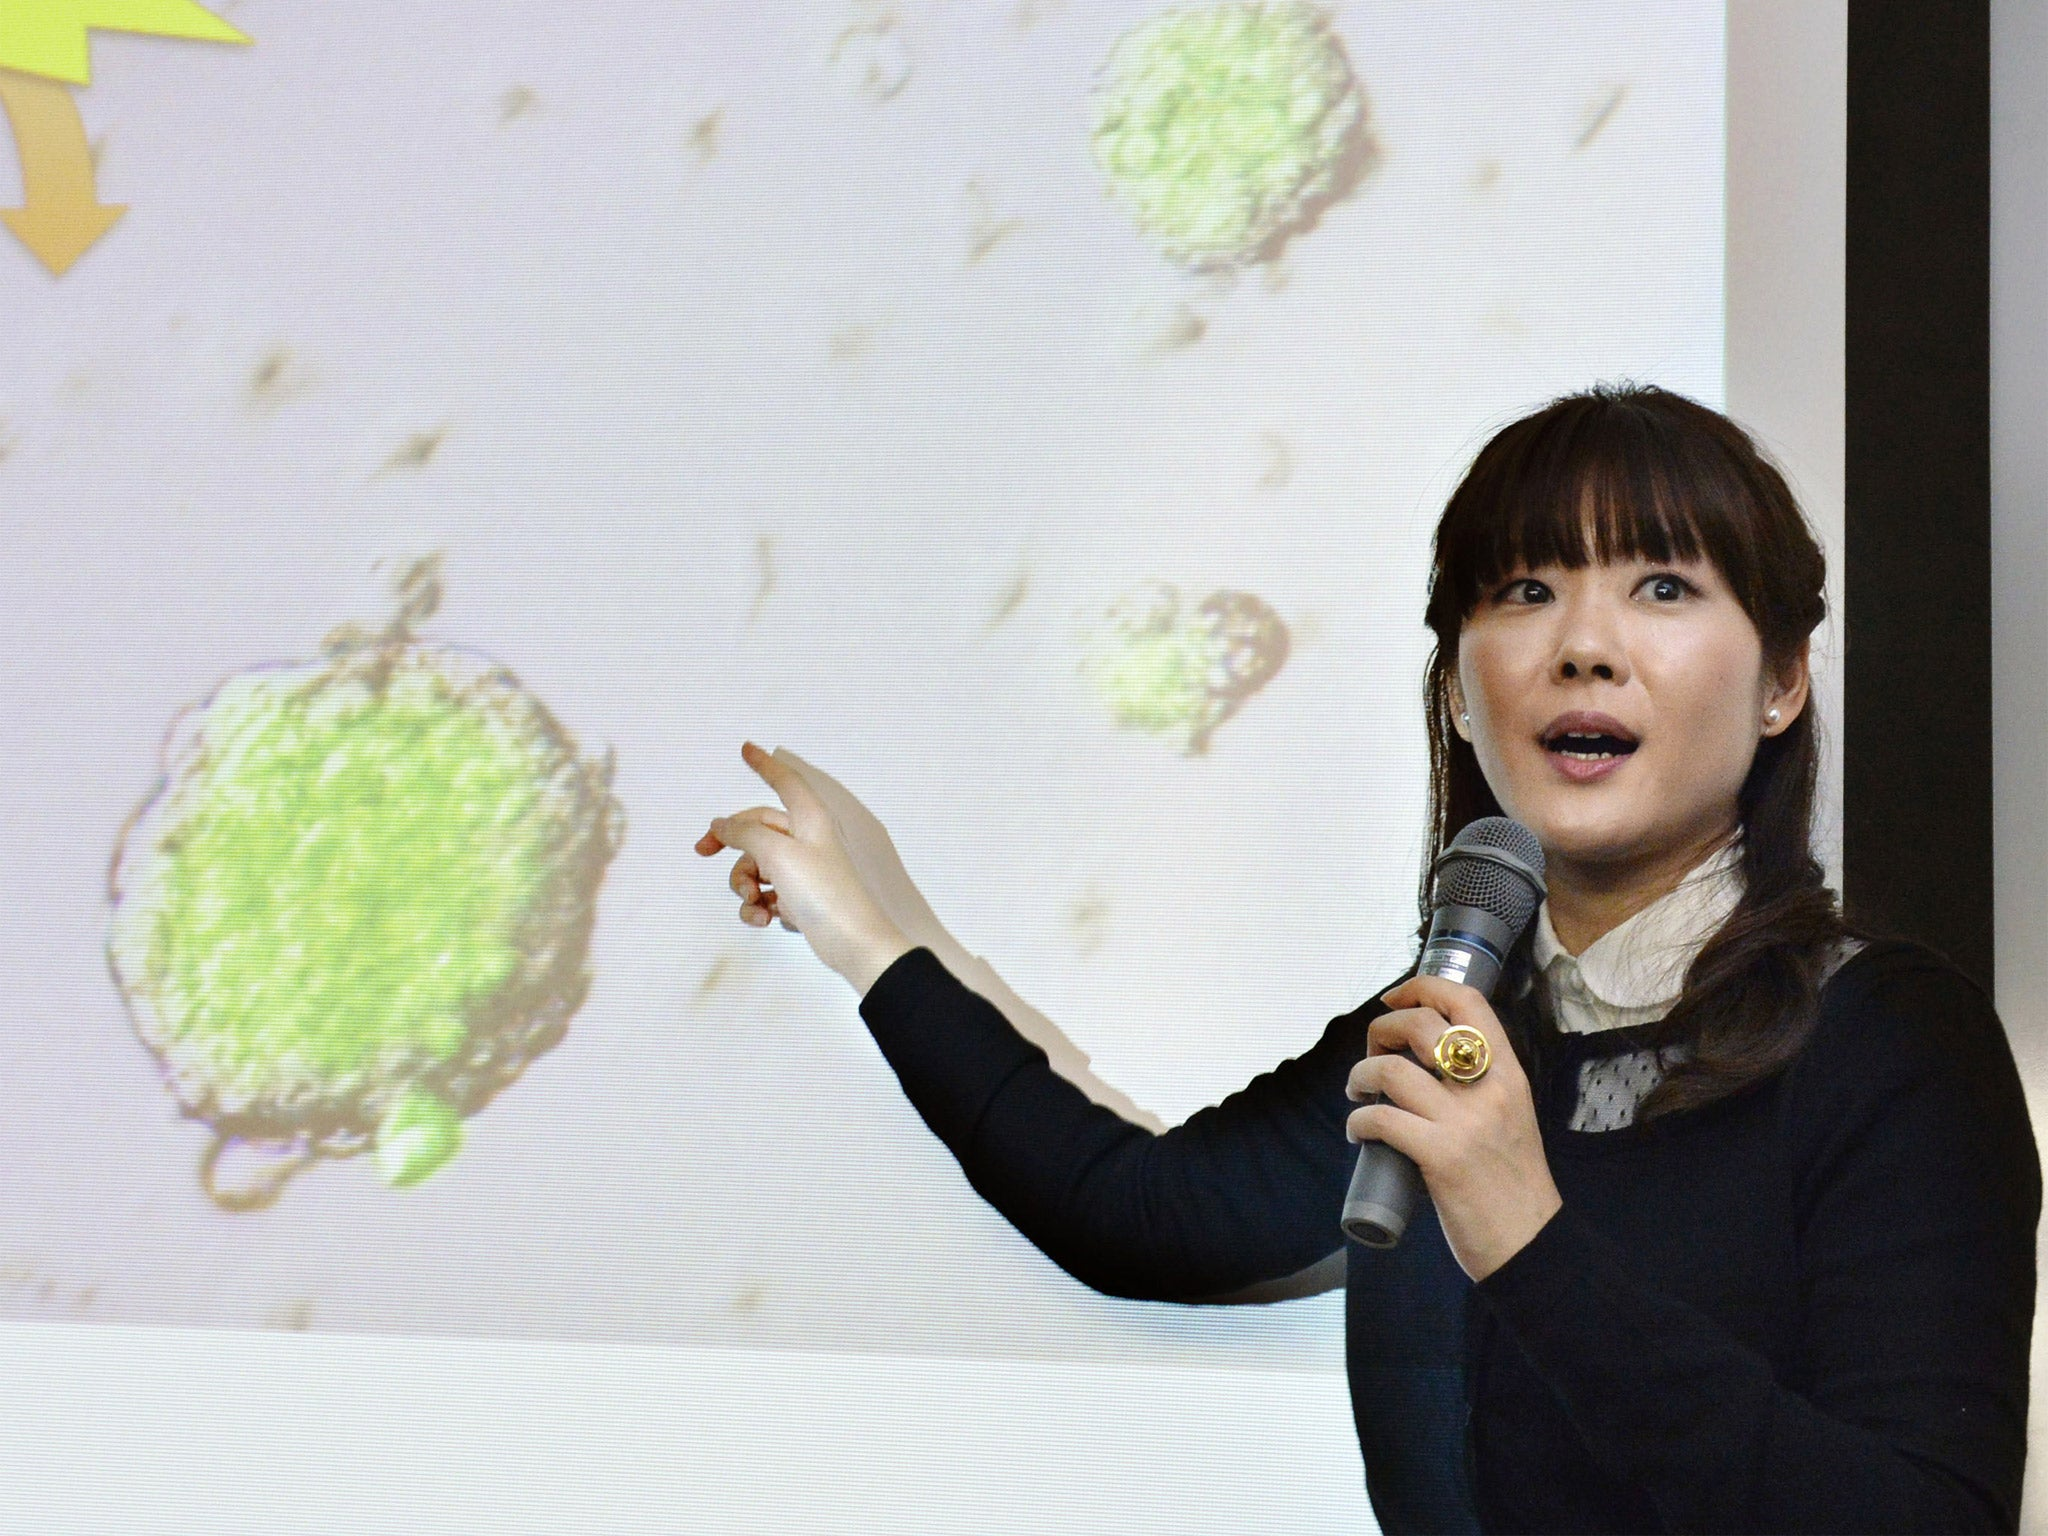 biyoloji extended essay research